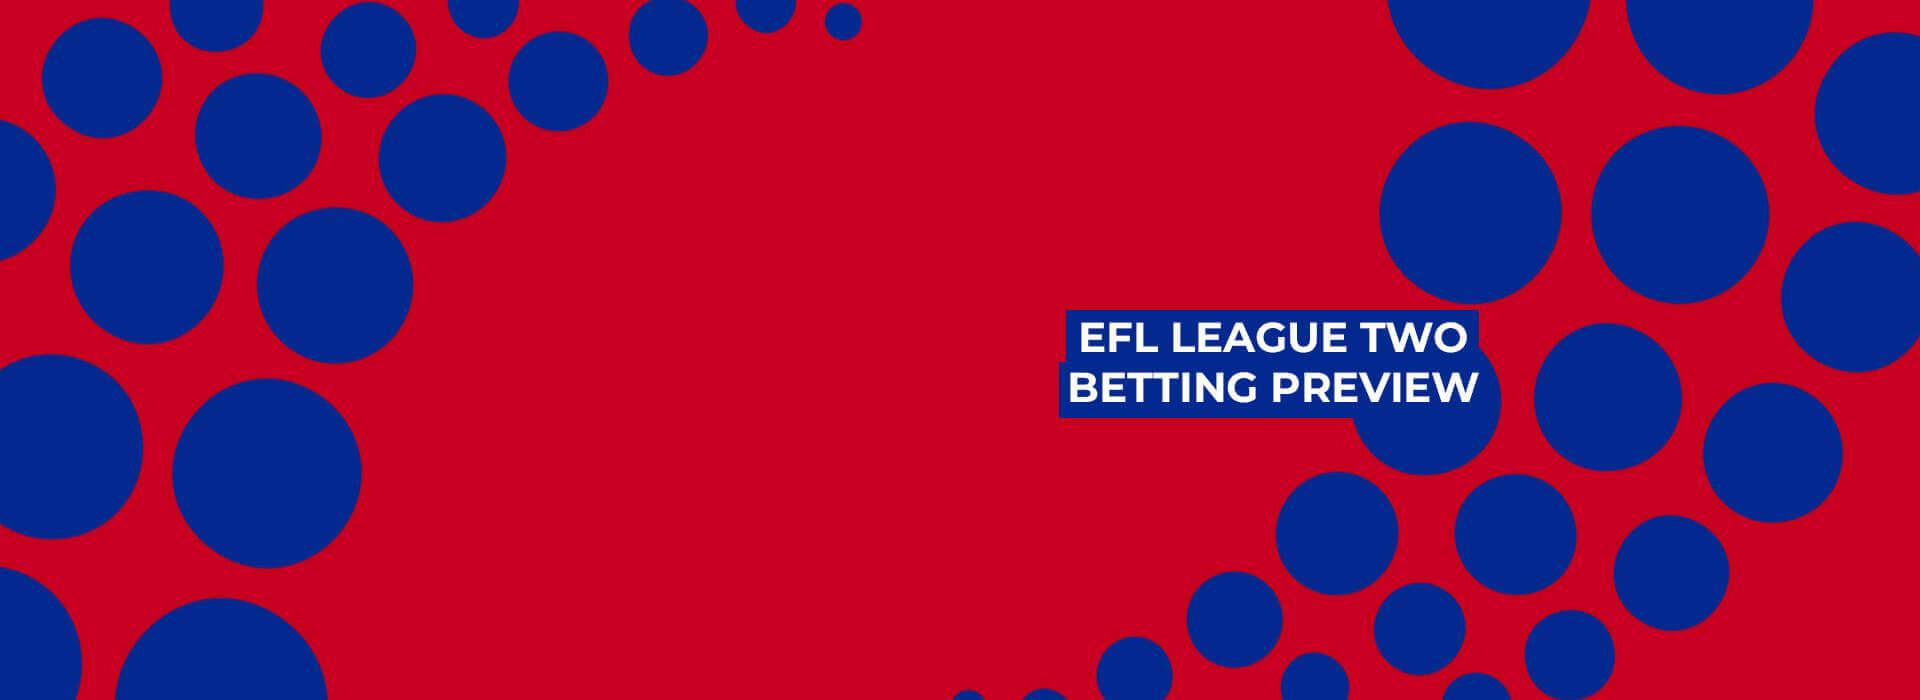 EFL League Two Season Betting Preview